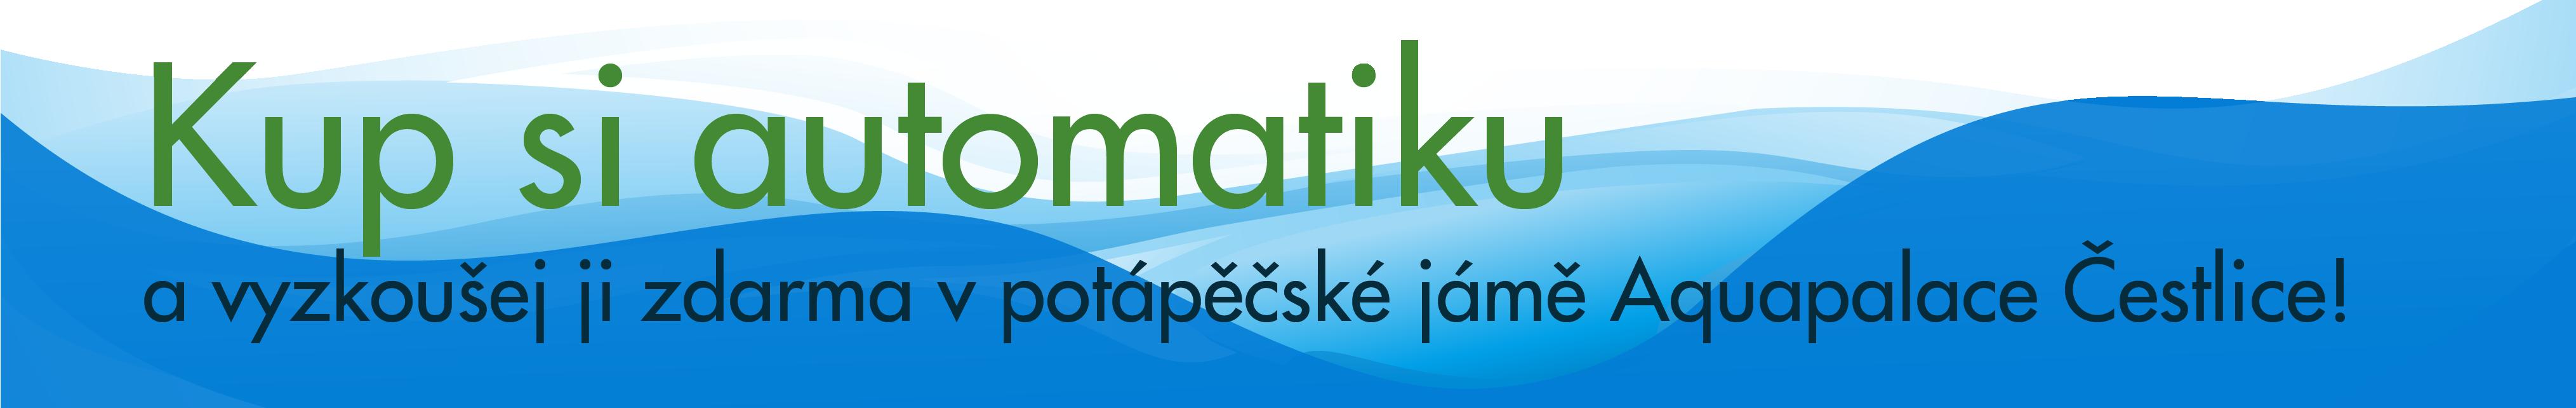 http%3A%2F%2Fwww.divers-direct.cz%2Fzdarma-zkouska-vybaveni-v-jame.html